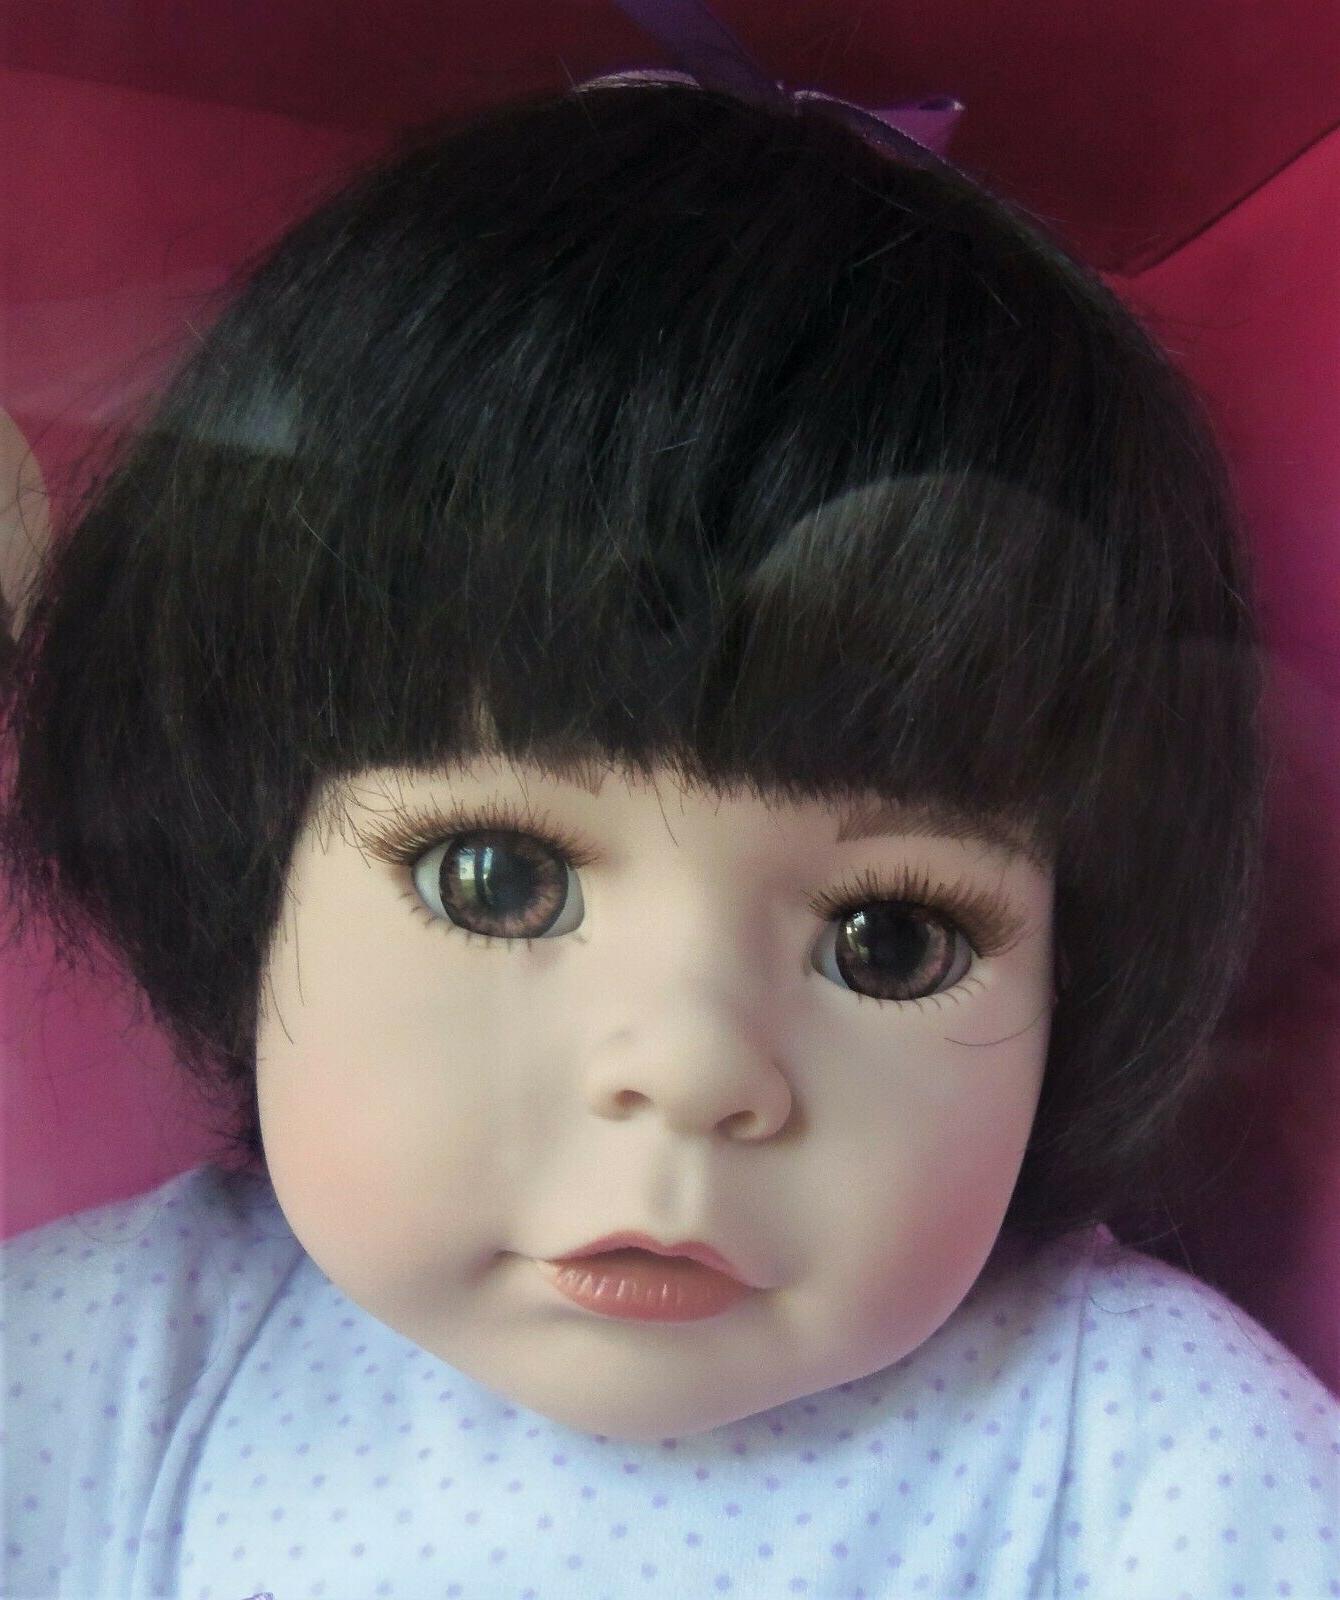 "ADORA PURPLE Charisma 18""? in Box Toddler"